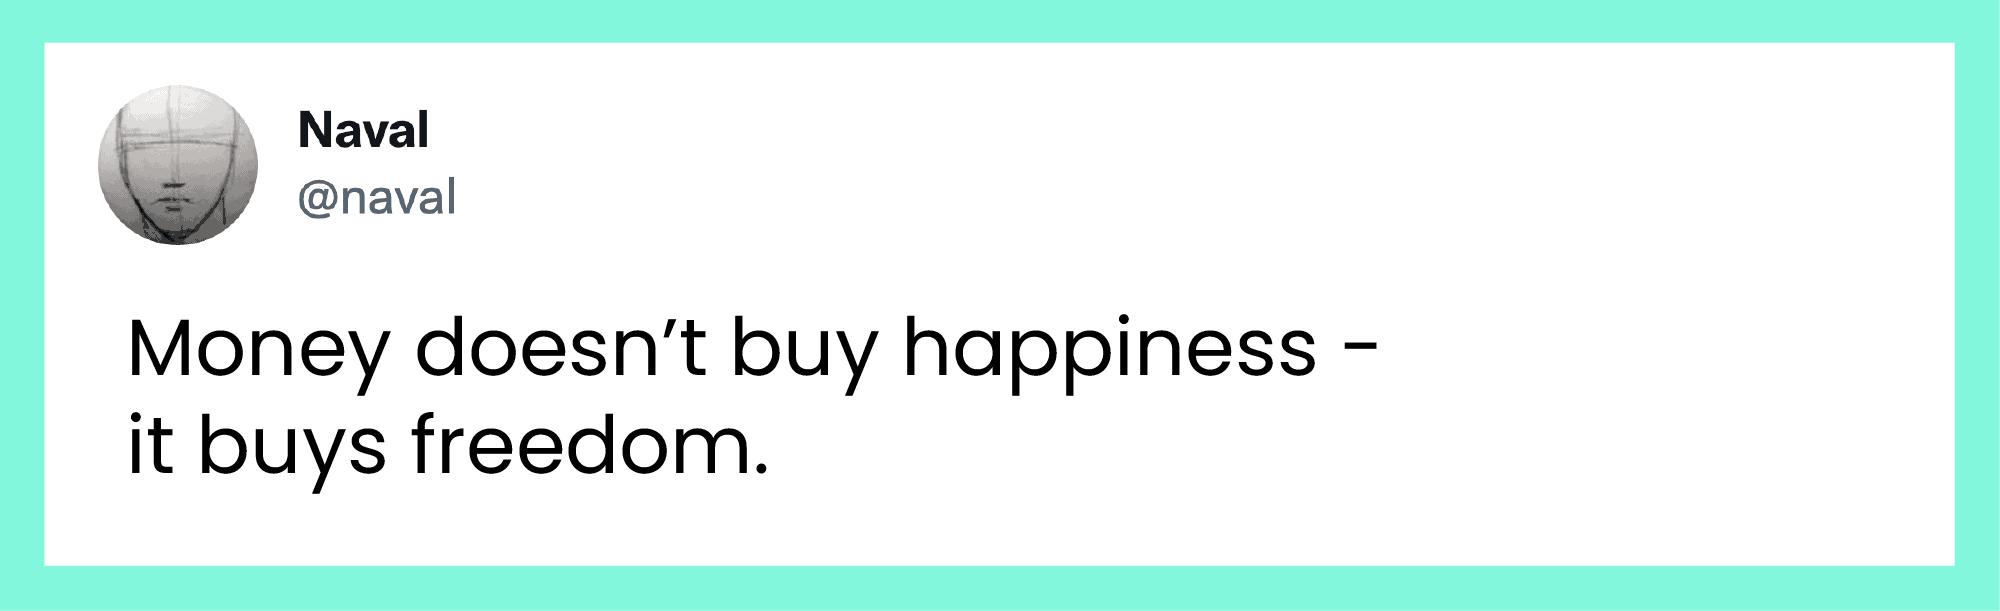 "Tweet: ""Money doesn't buy happiness - it buys freedom."